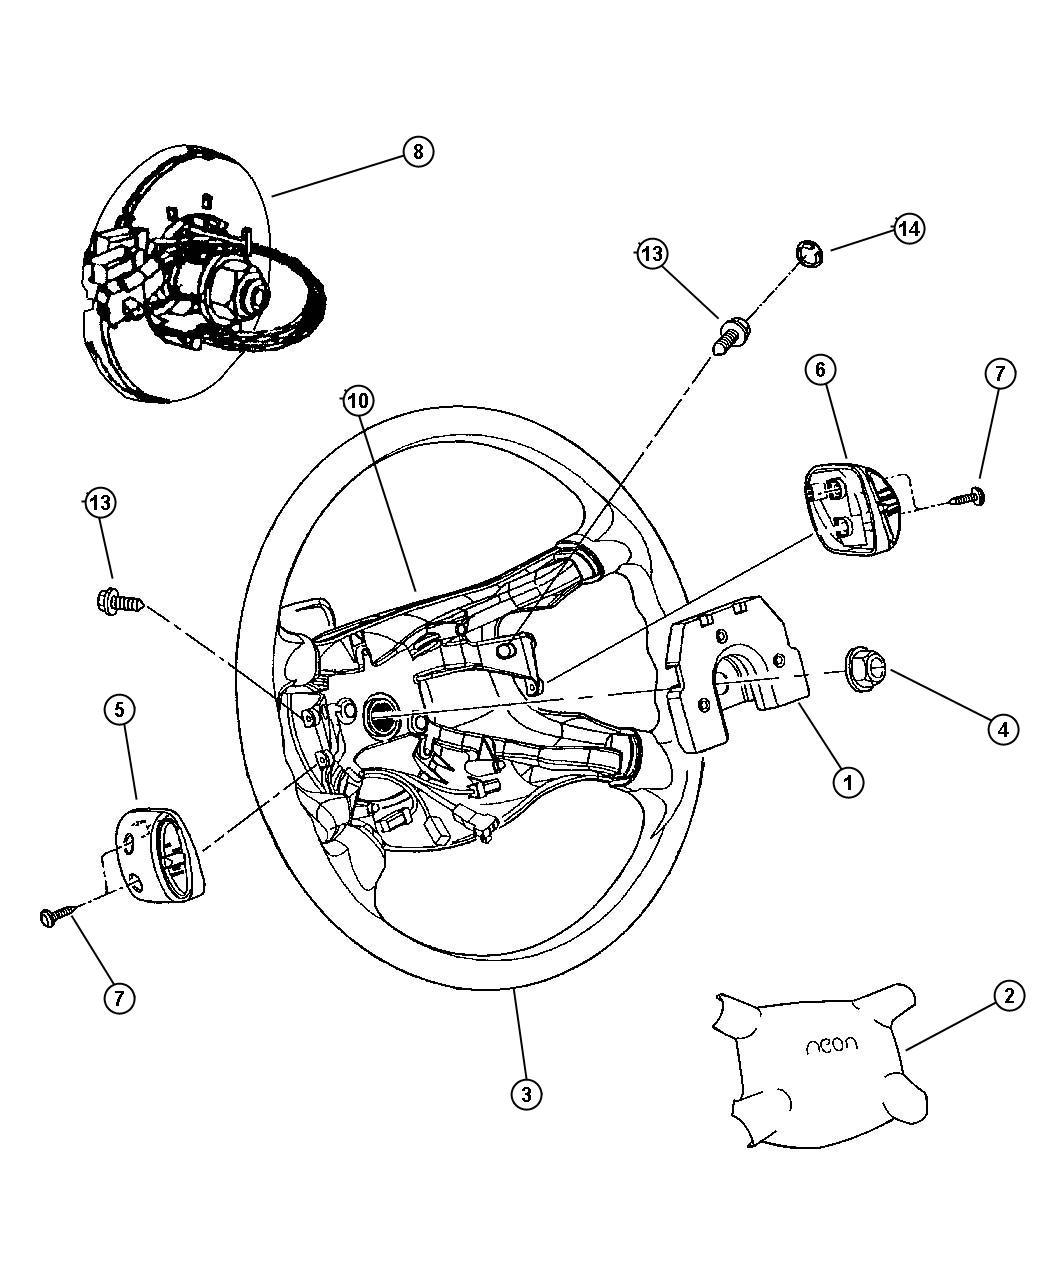 2000 Dodge Neon Clockspring. [cgw], three circuit. Sound